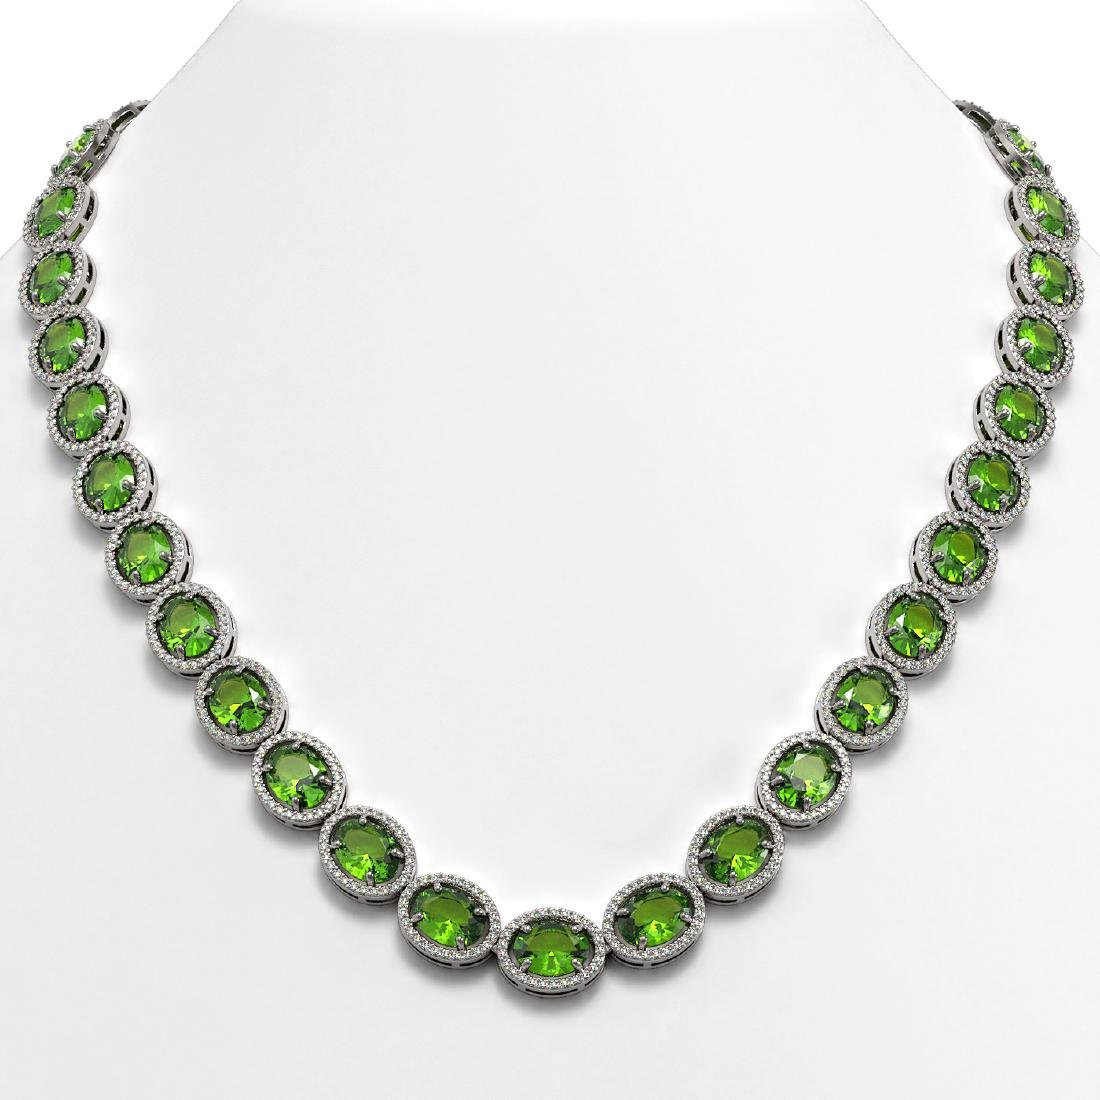 64.84 CTW Peridot & Diamond Halo Necklace 10K White